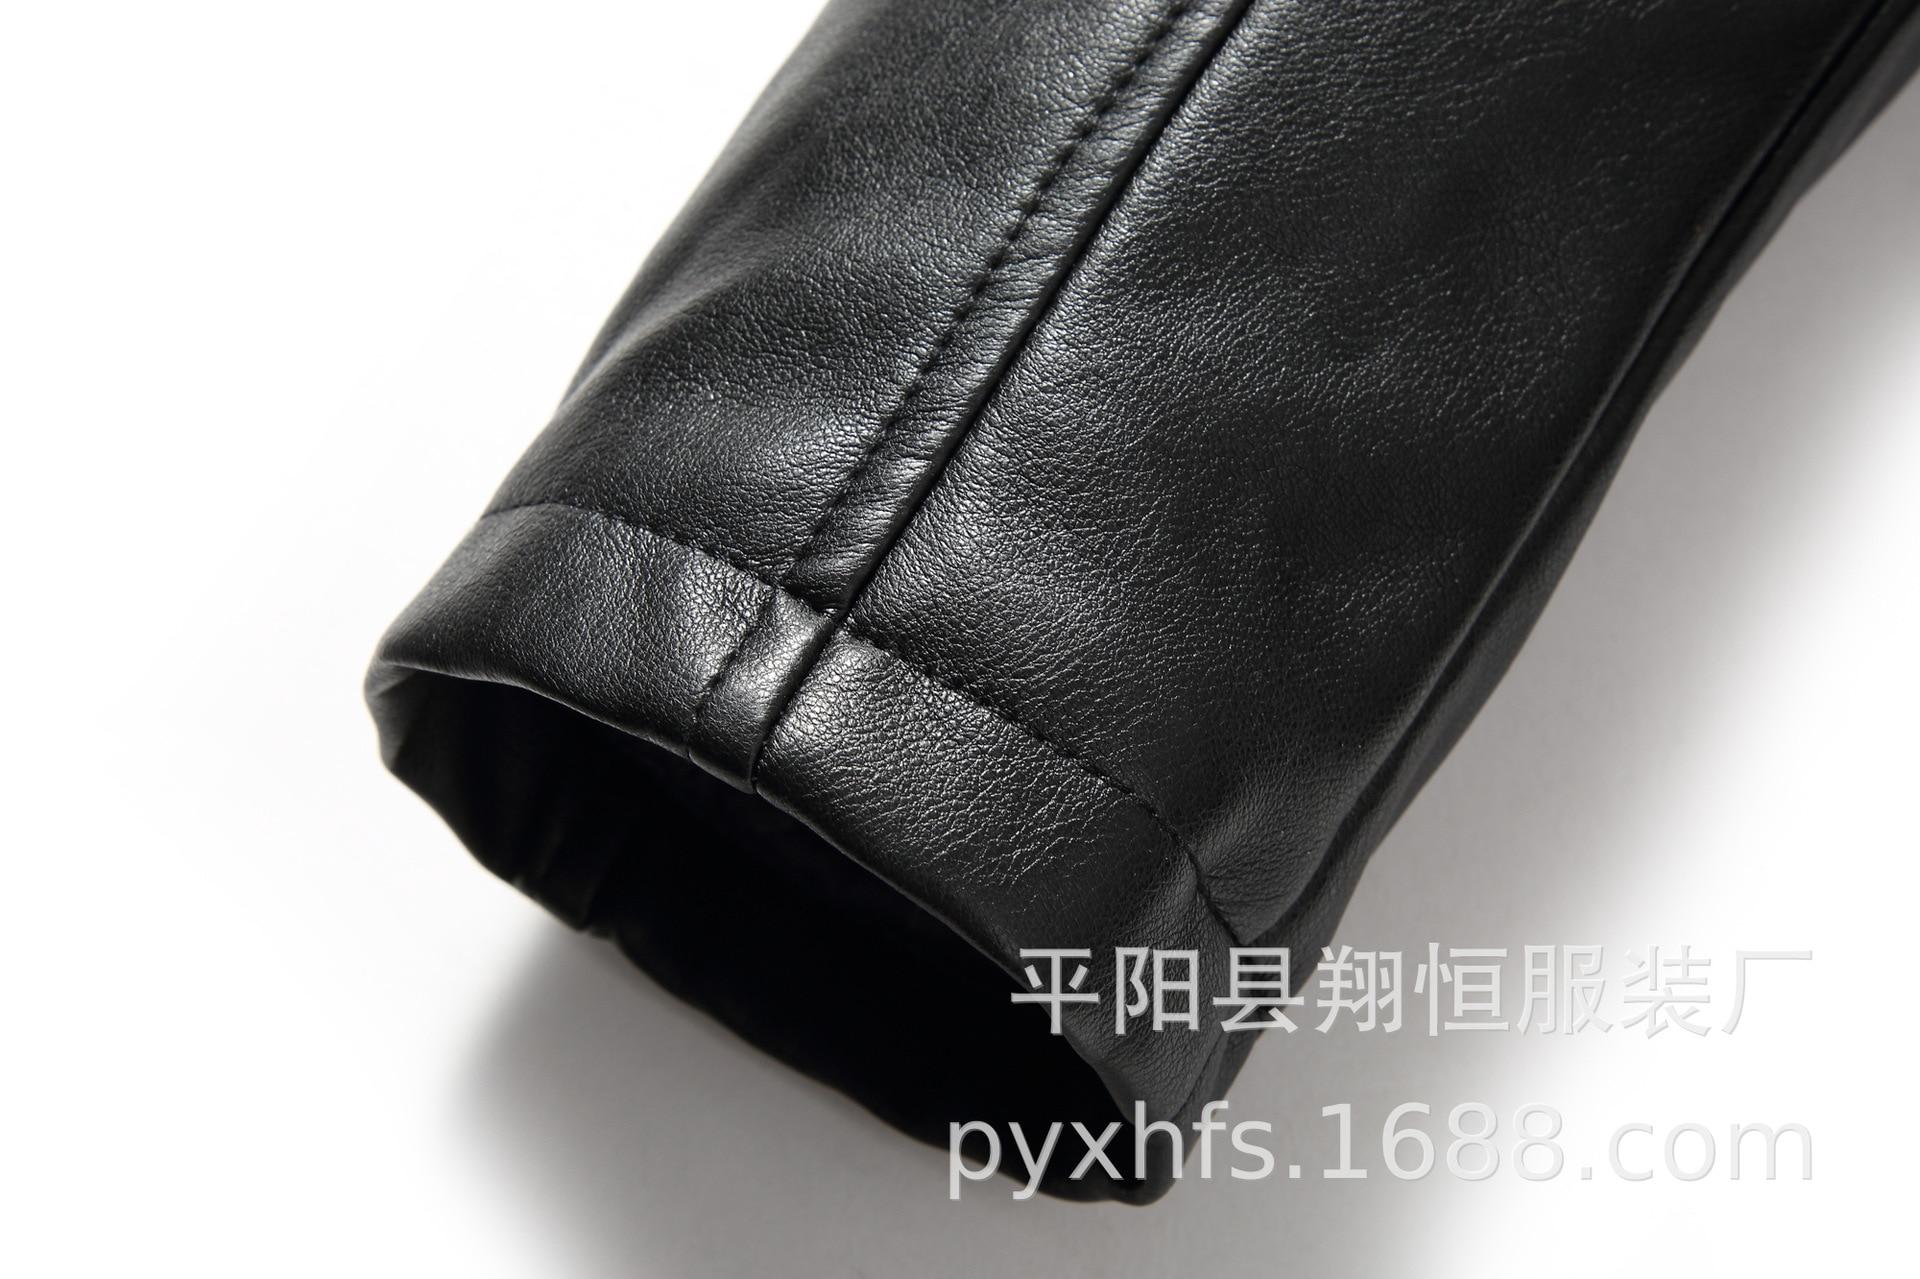 418A6096.JPG